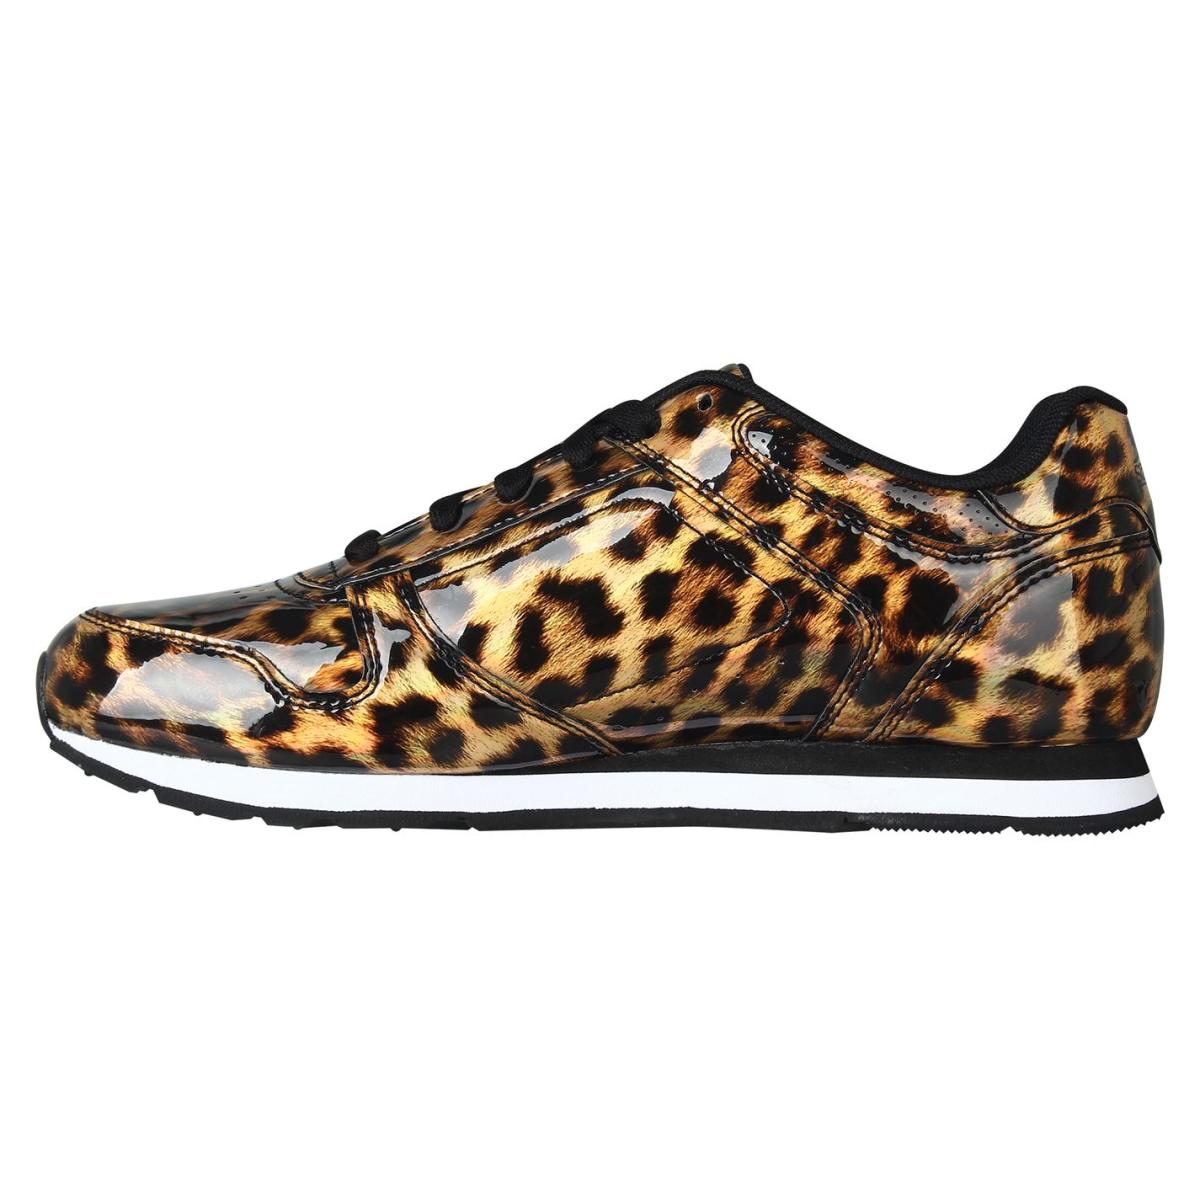 Slazenger-Classic-Turnschuhe-Laufschuhe-Damen-Sportschuhe-Sneaker-1265 Indexbild 13